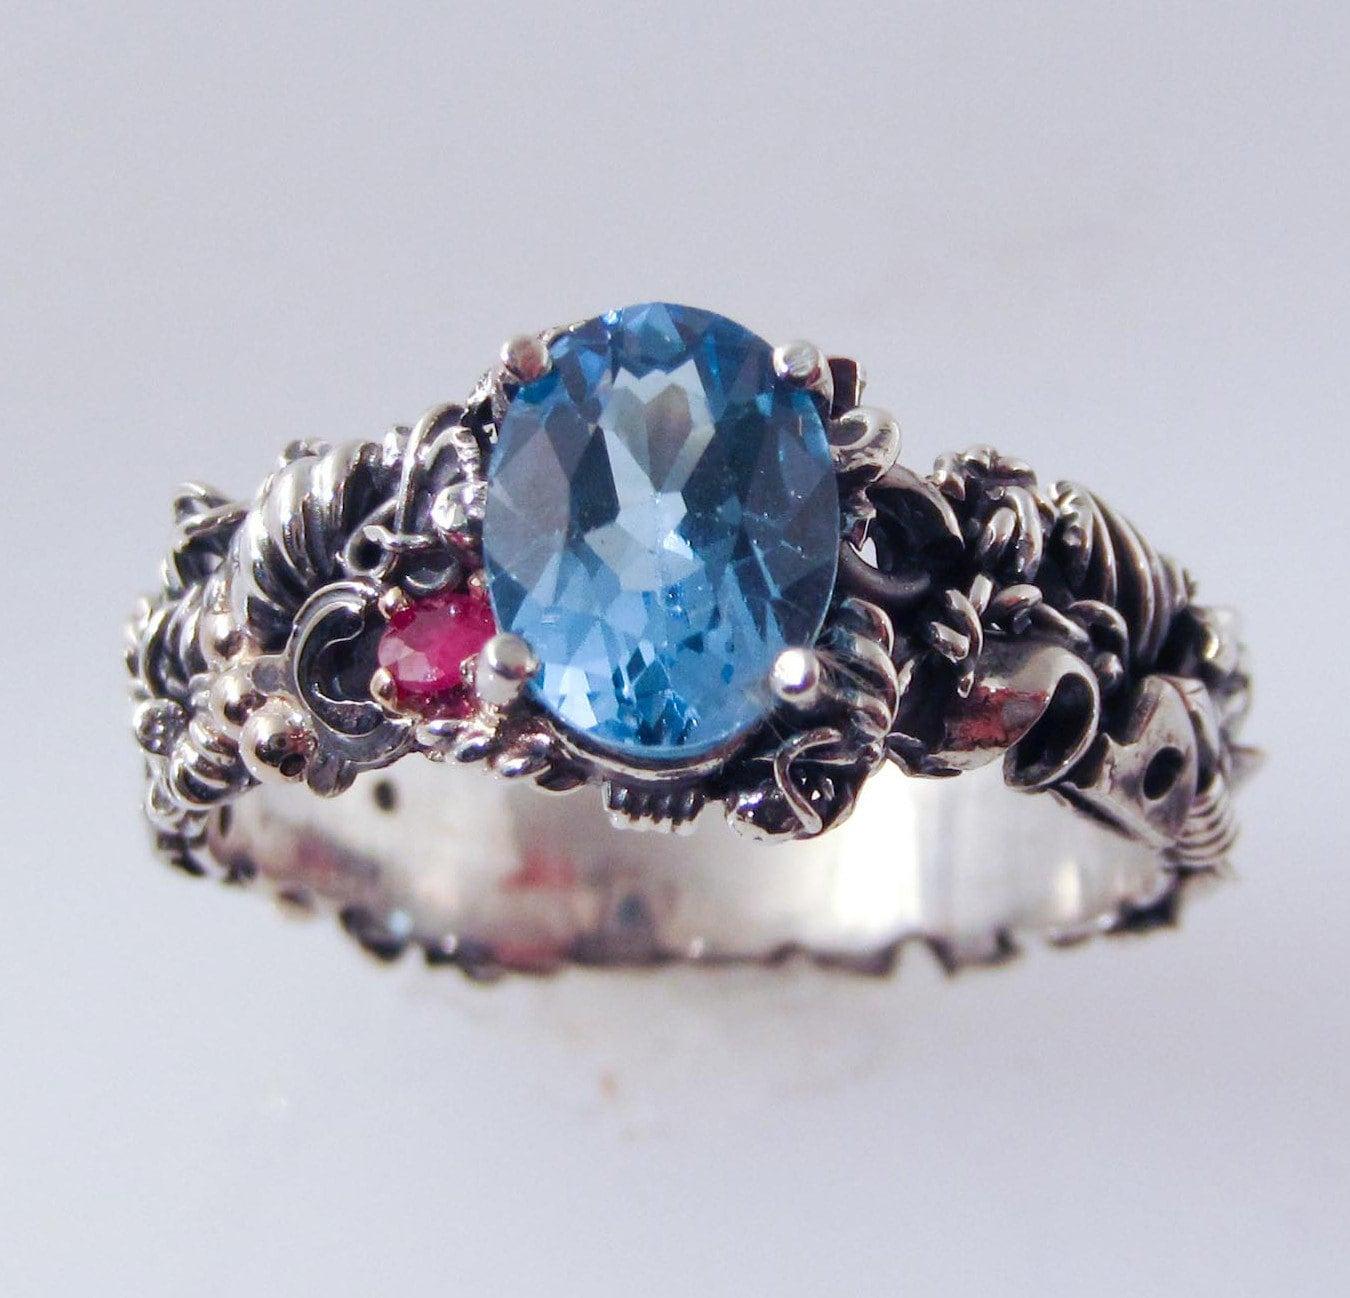 Blue Topaz Steampunk Engagement Ring By FernandoJewelry On Etsy